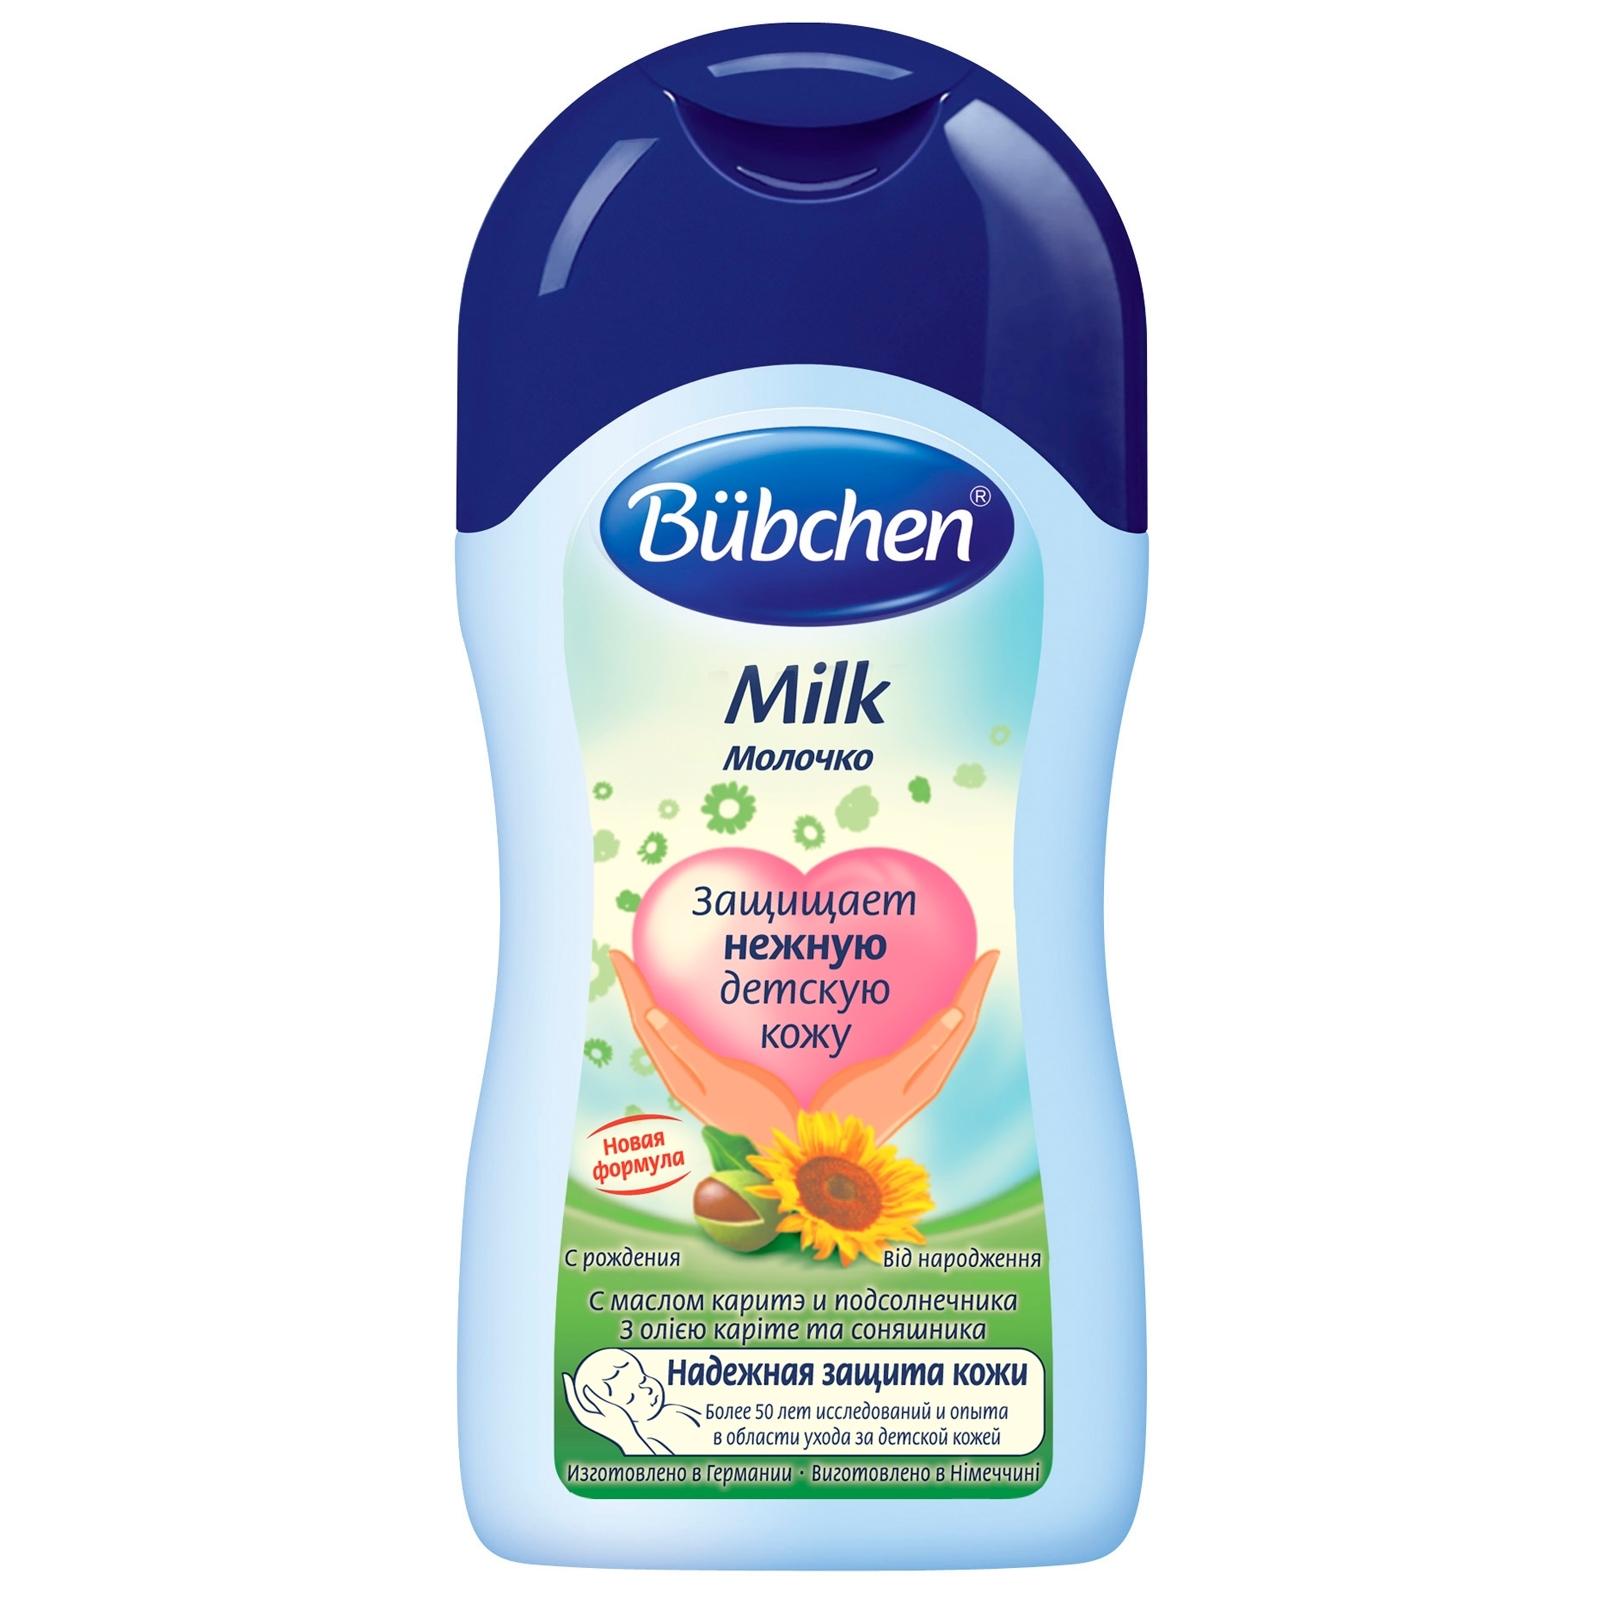 ������� Bubchen ����������� 200 ��  � ������� ������ � �������������